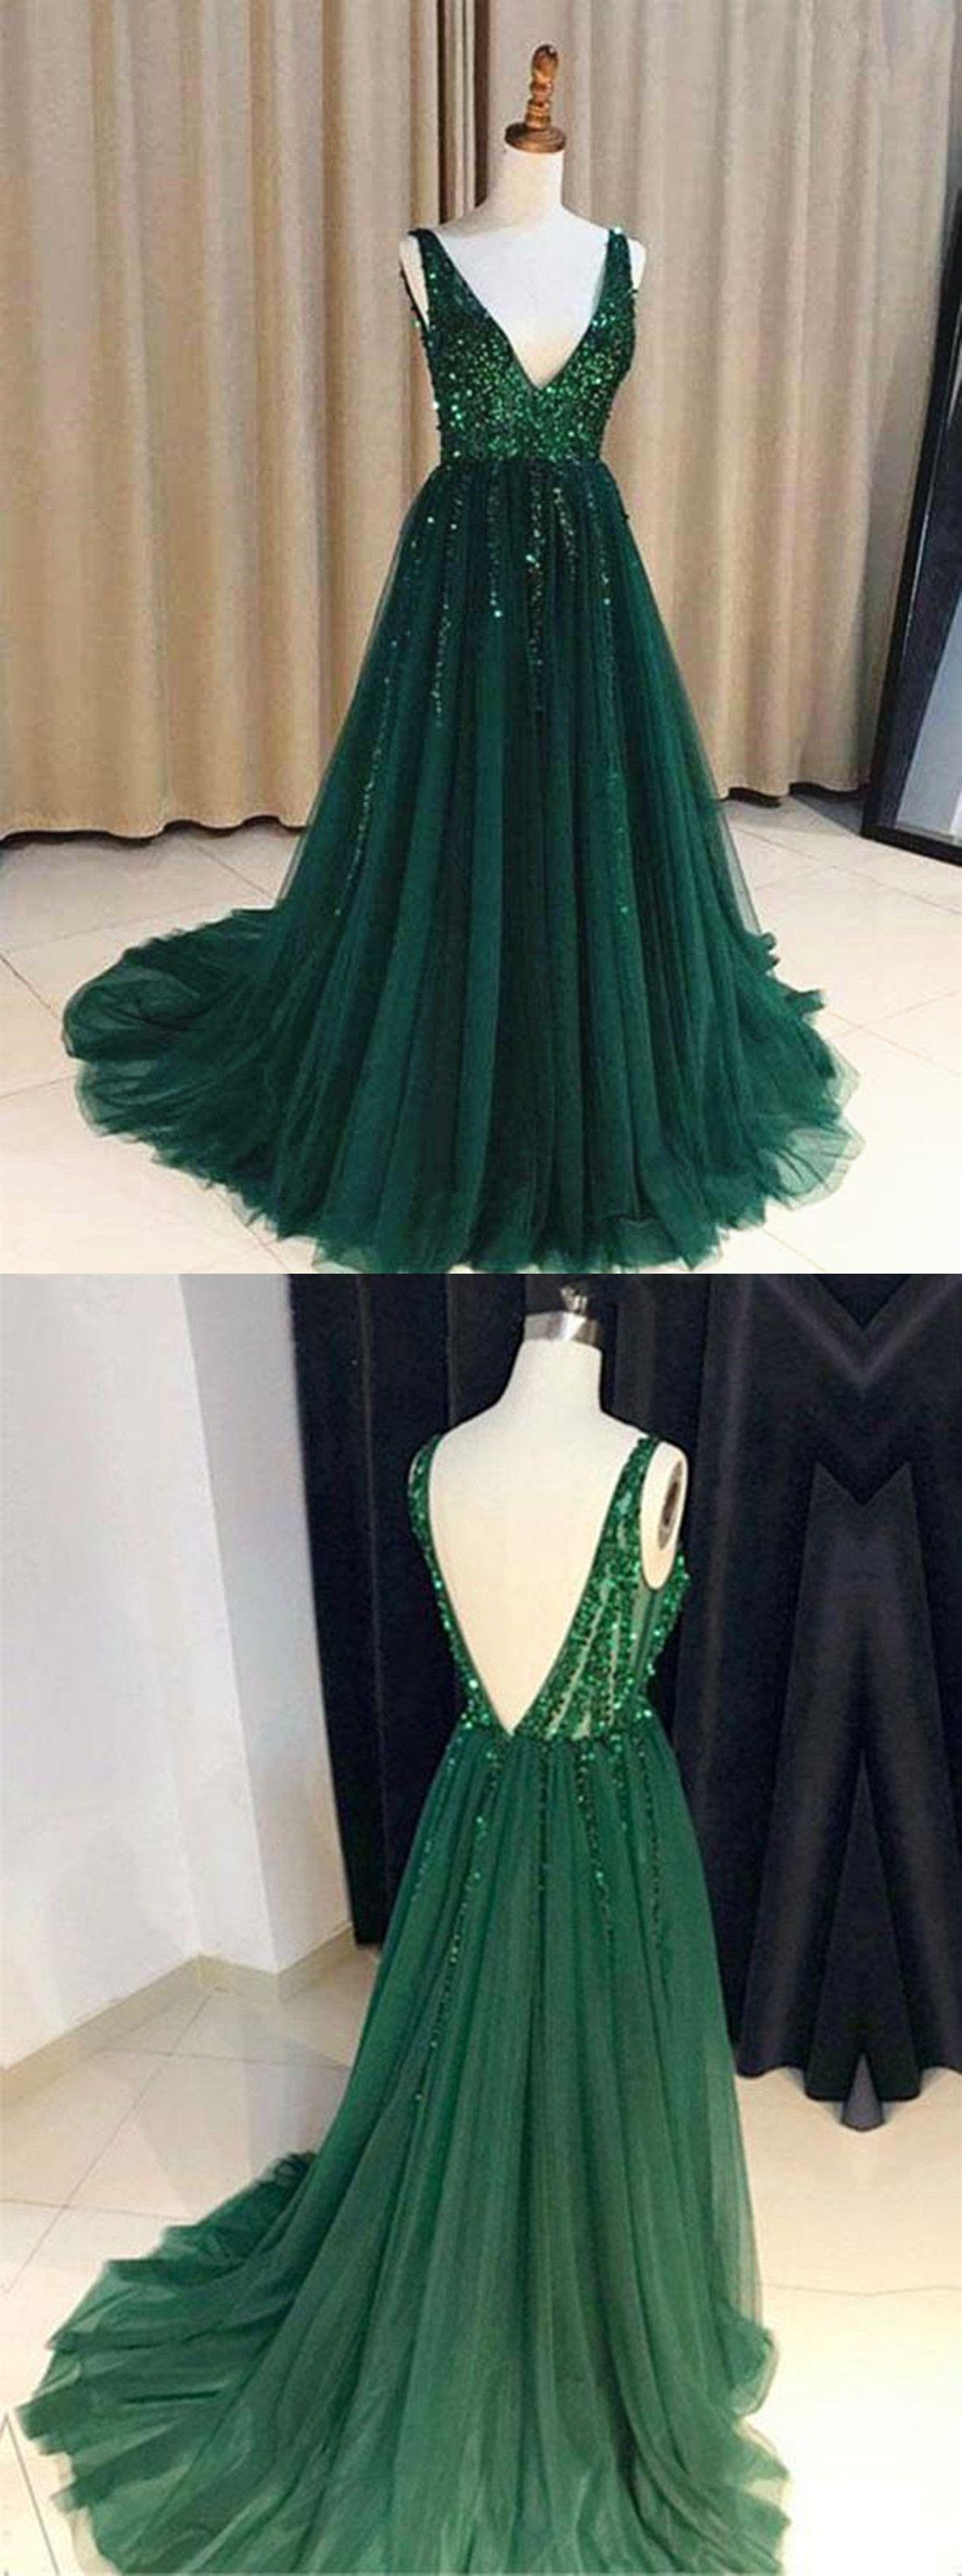 Custom made a line v neck emerald green backless prom